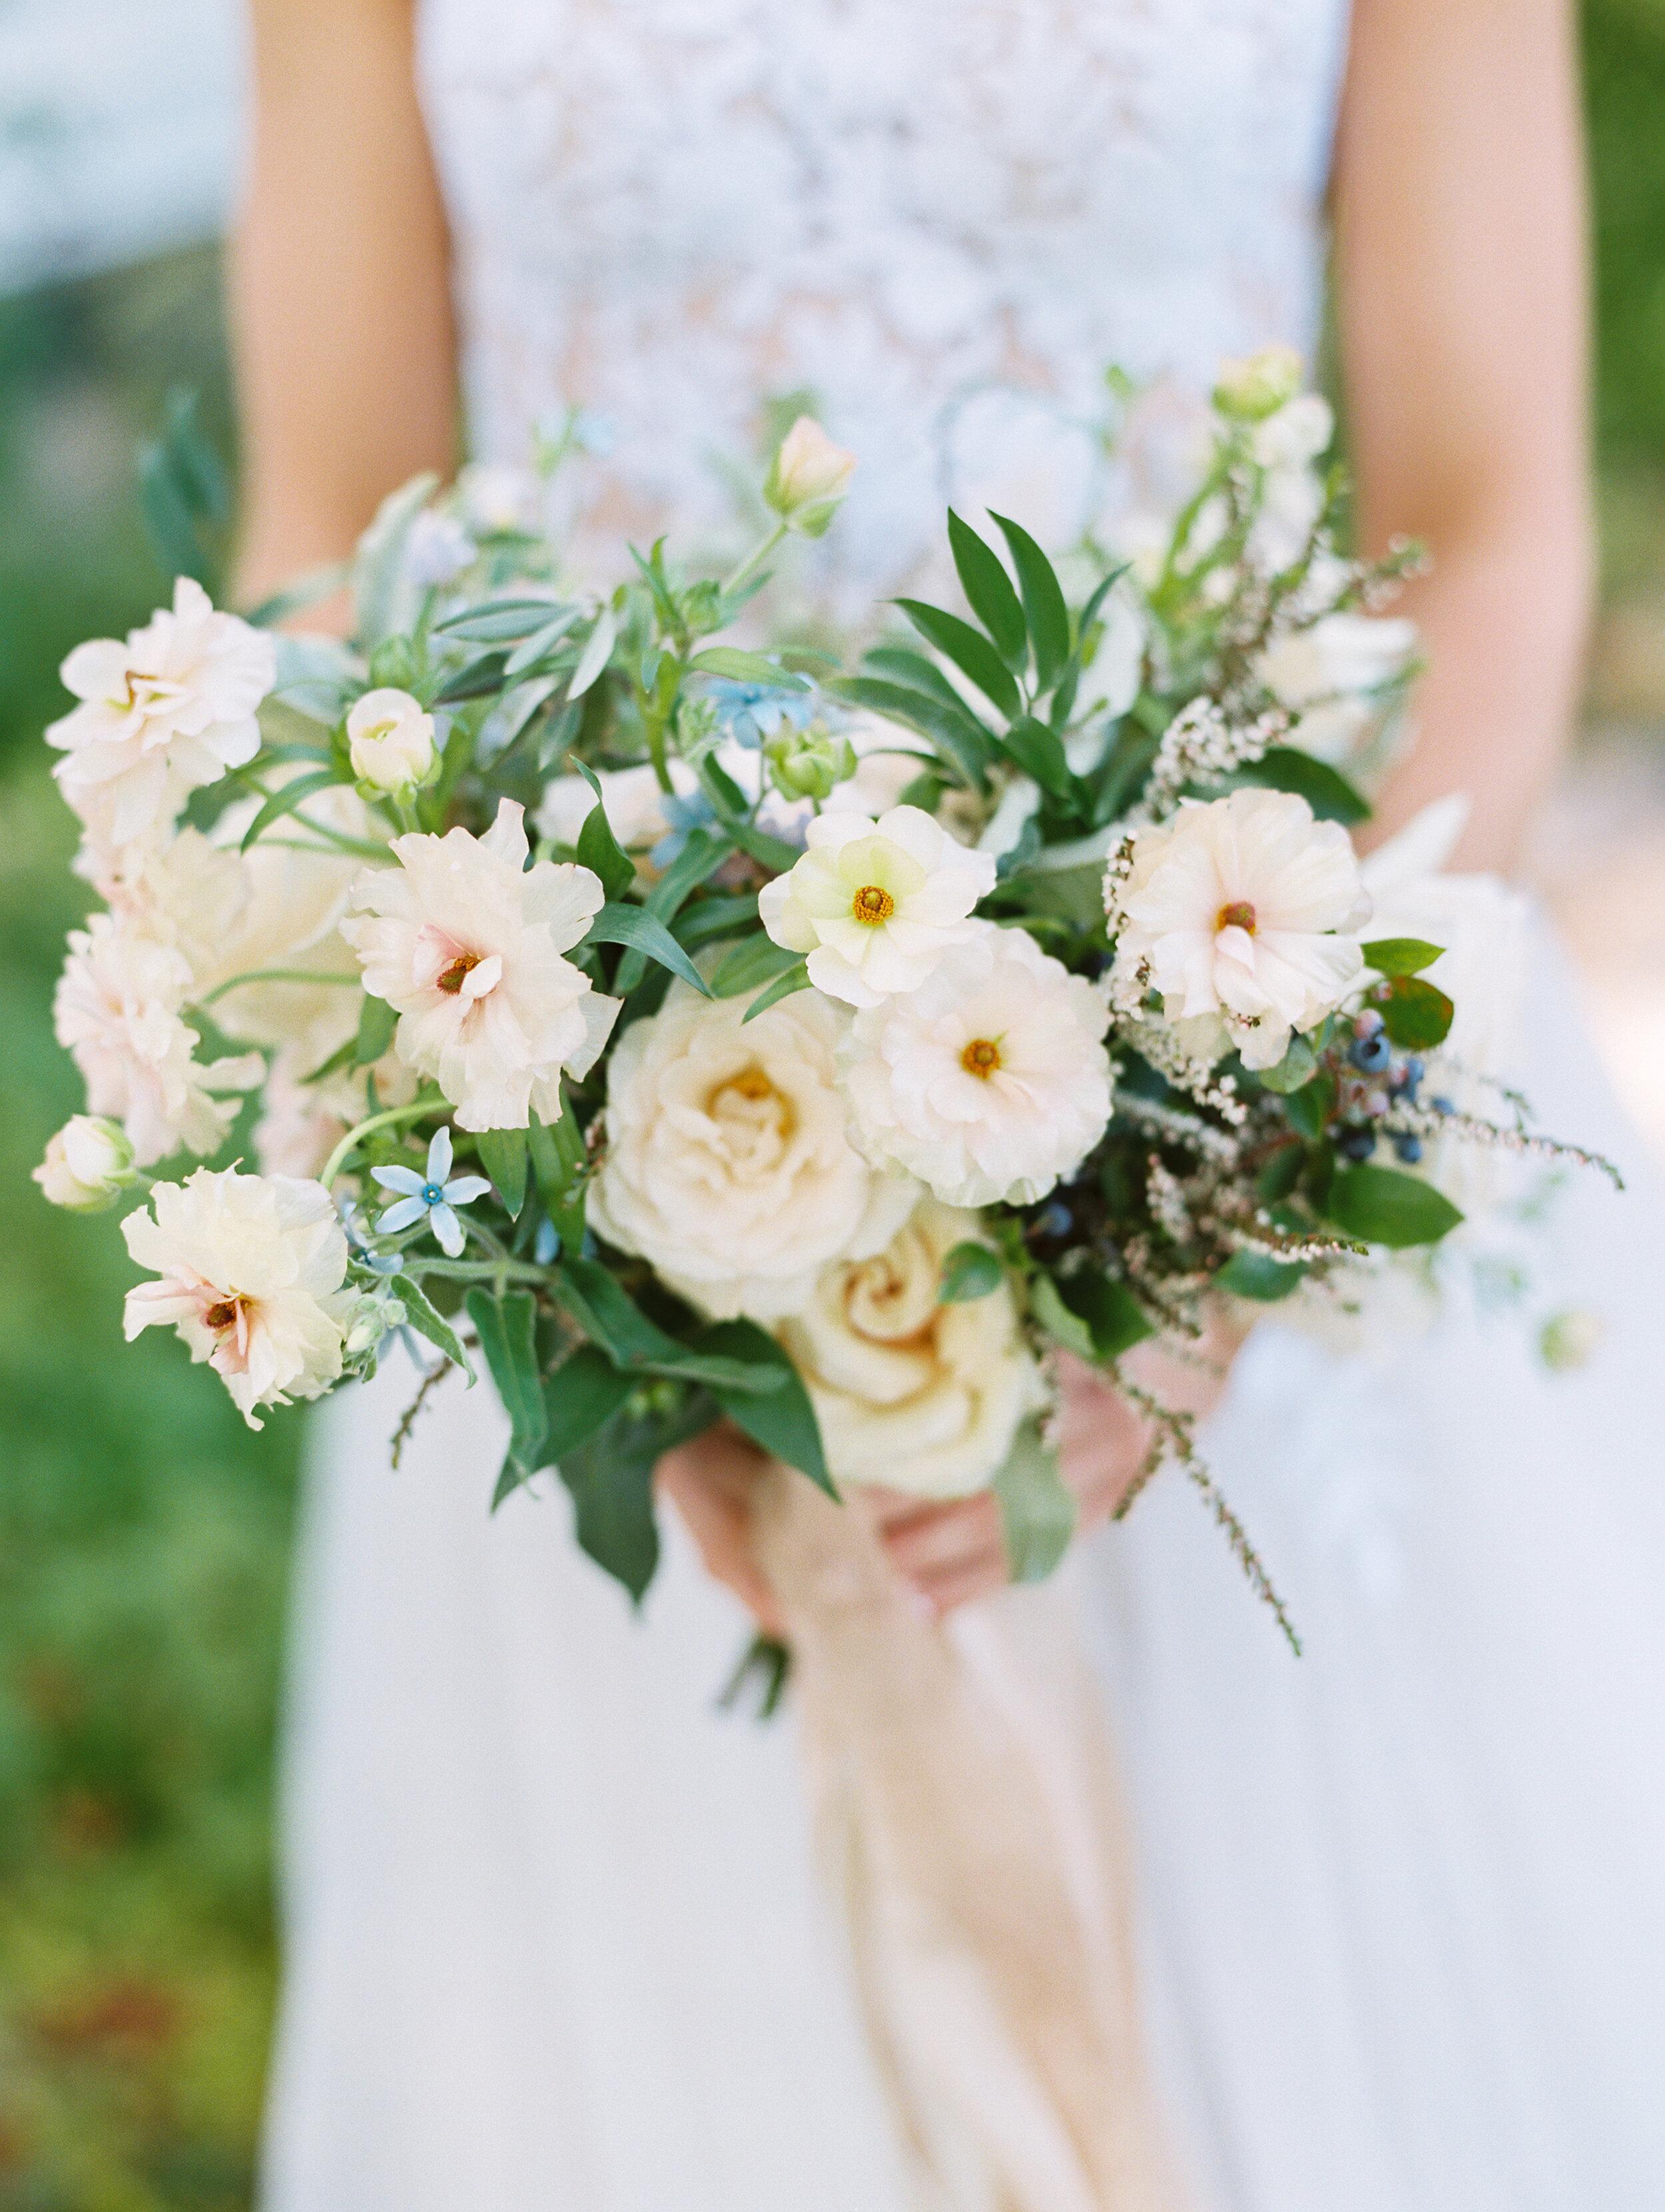 Steinlage+Wedding+Getting+Ready-78.jpg